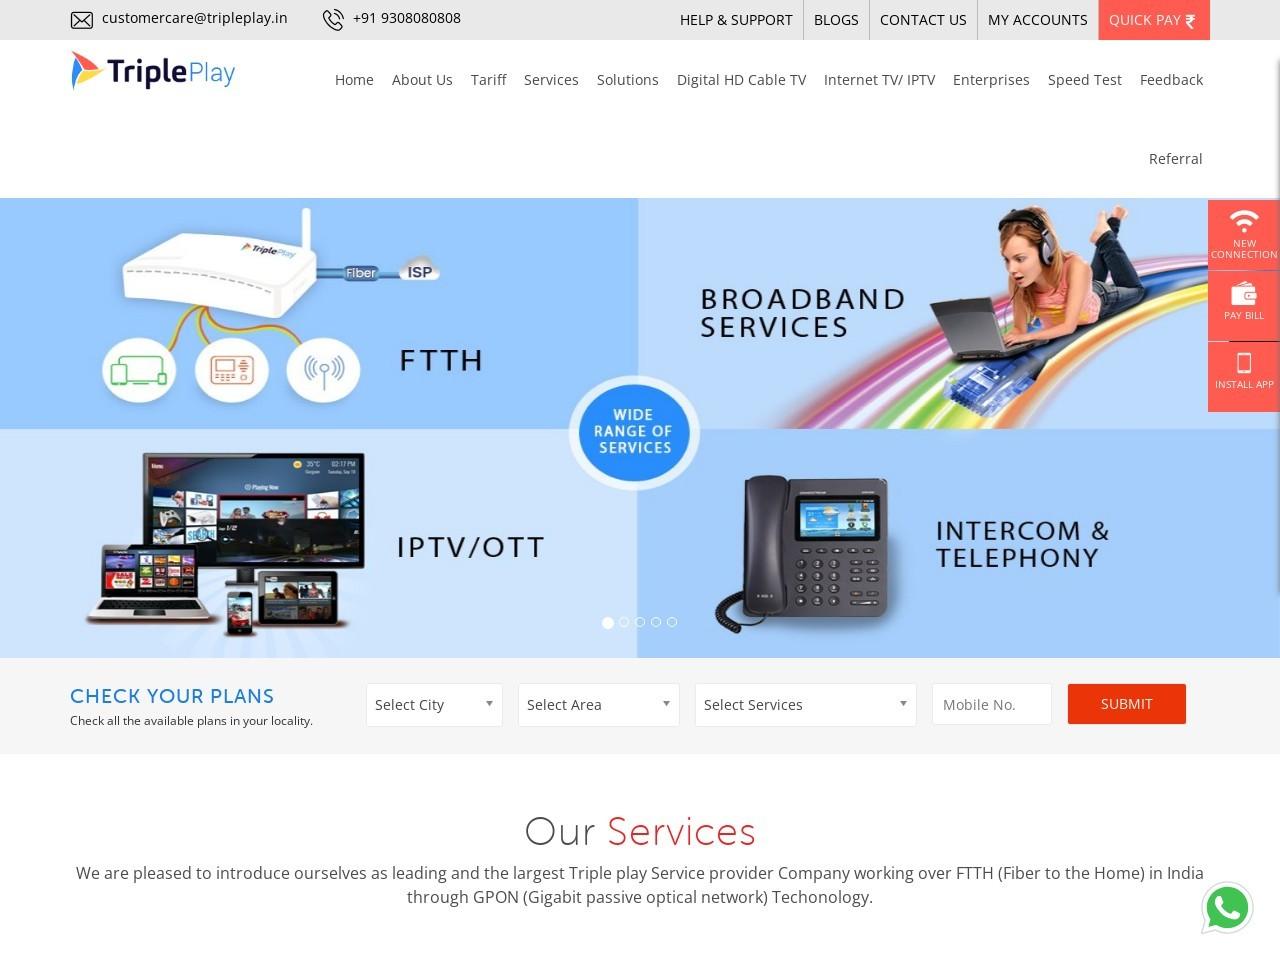 Broadband Internet Plans in Prateek Wisteria G8 Noida